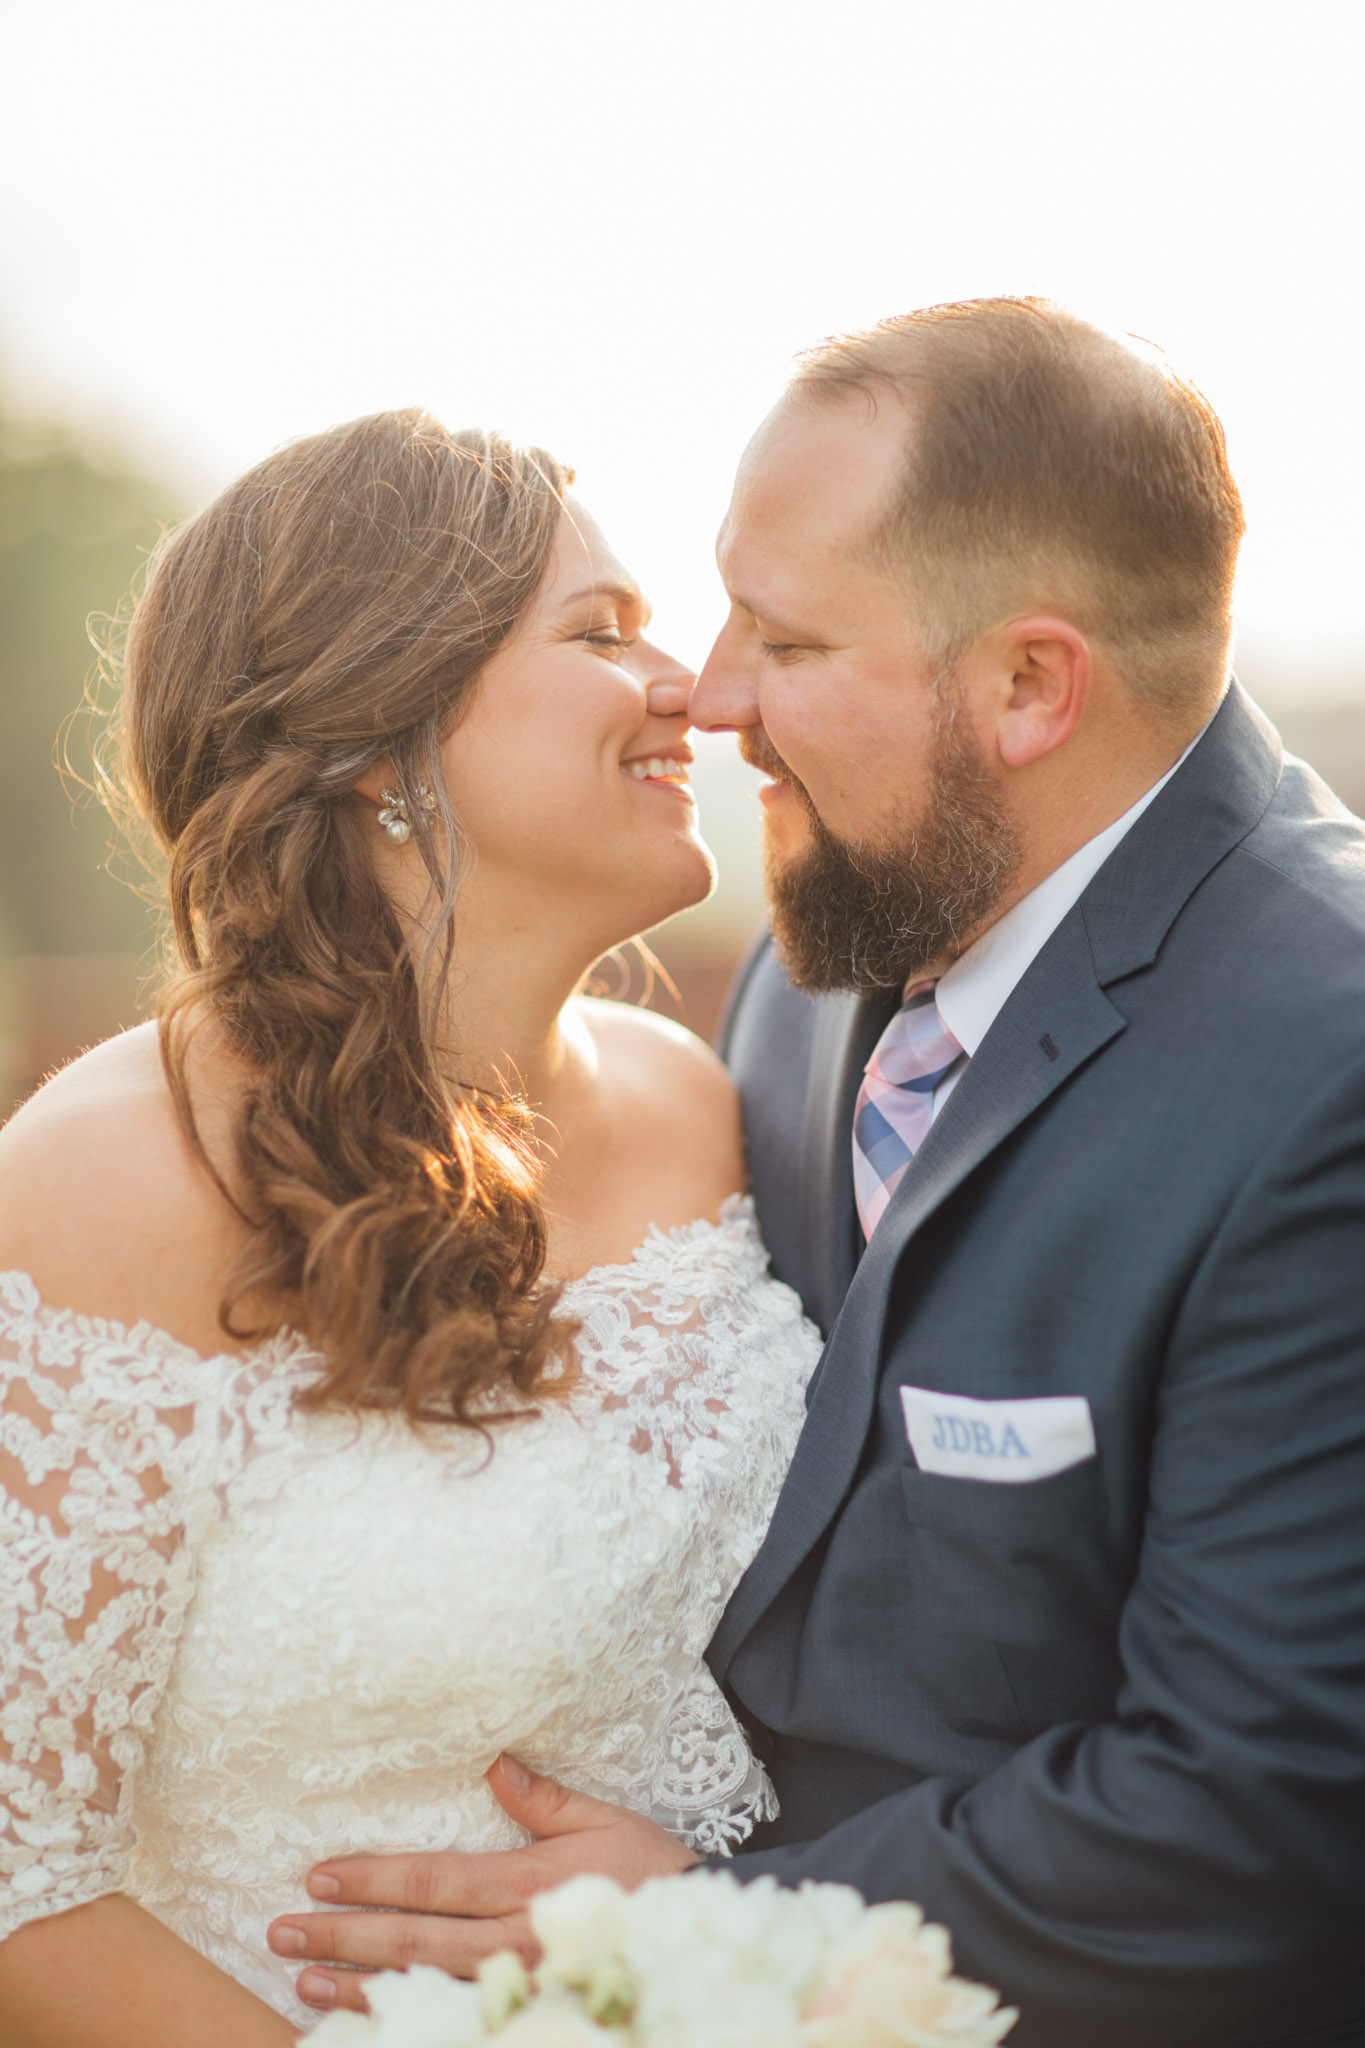 Country Club of Virginia Wedding Photographer_0079.jpg